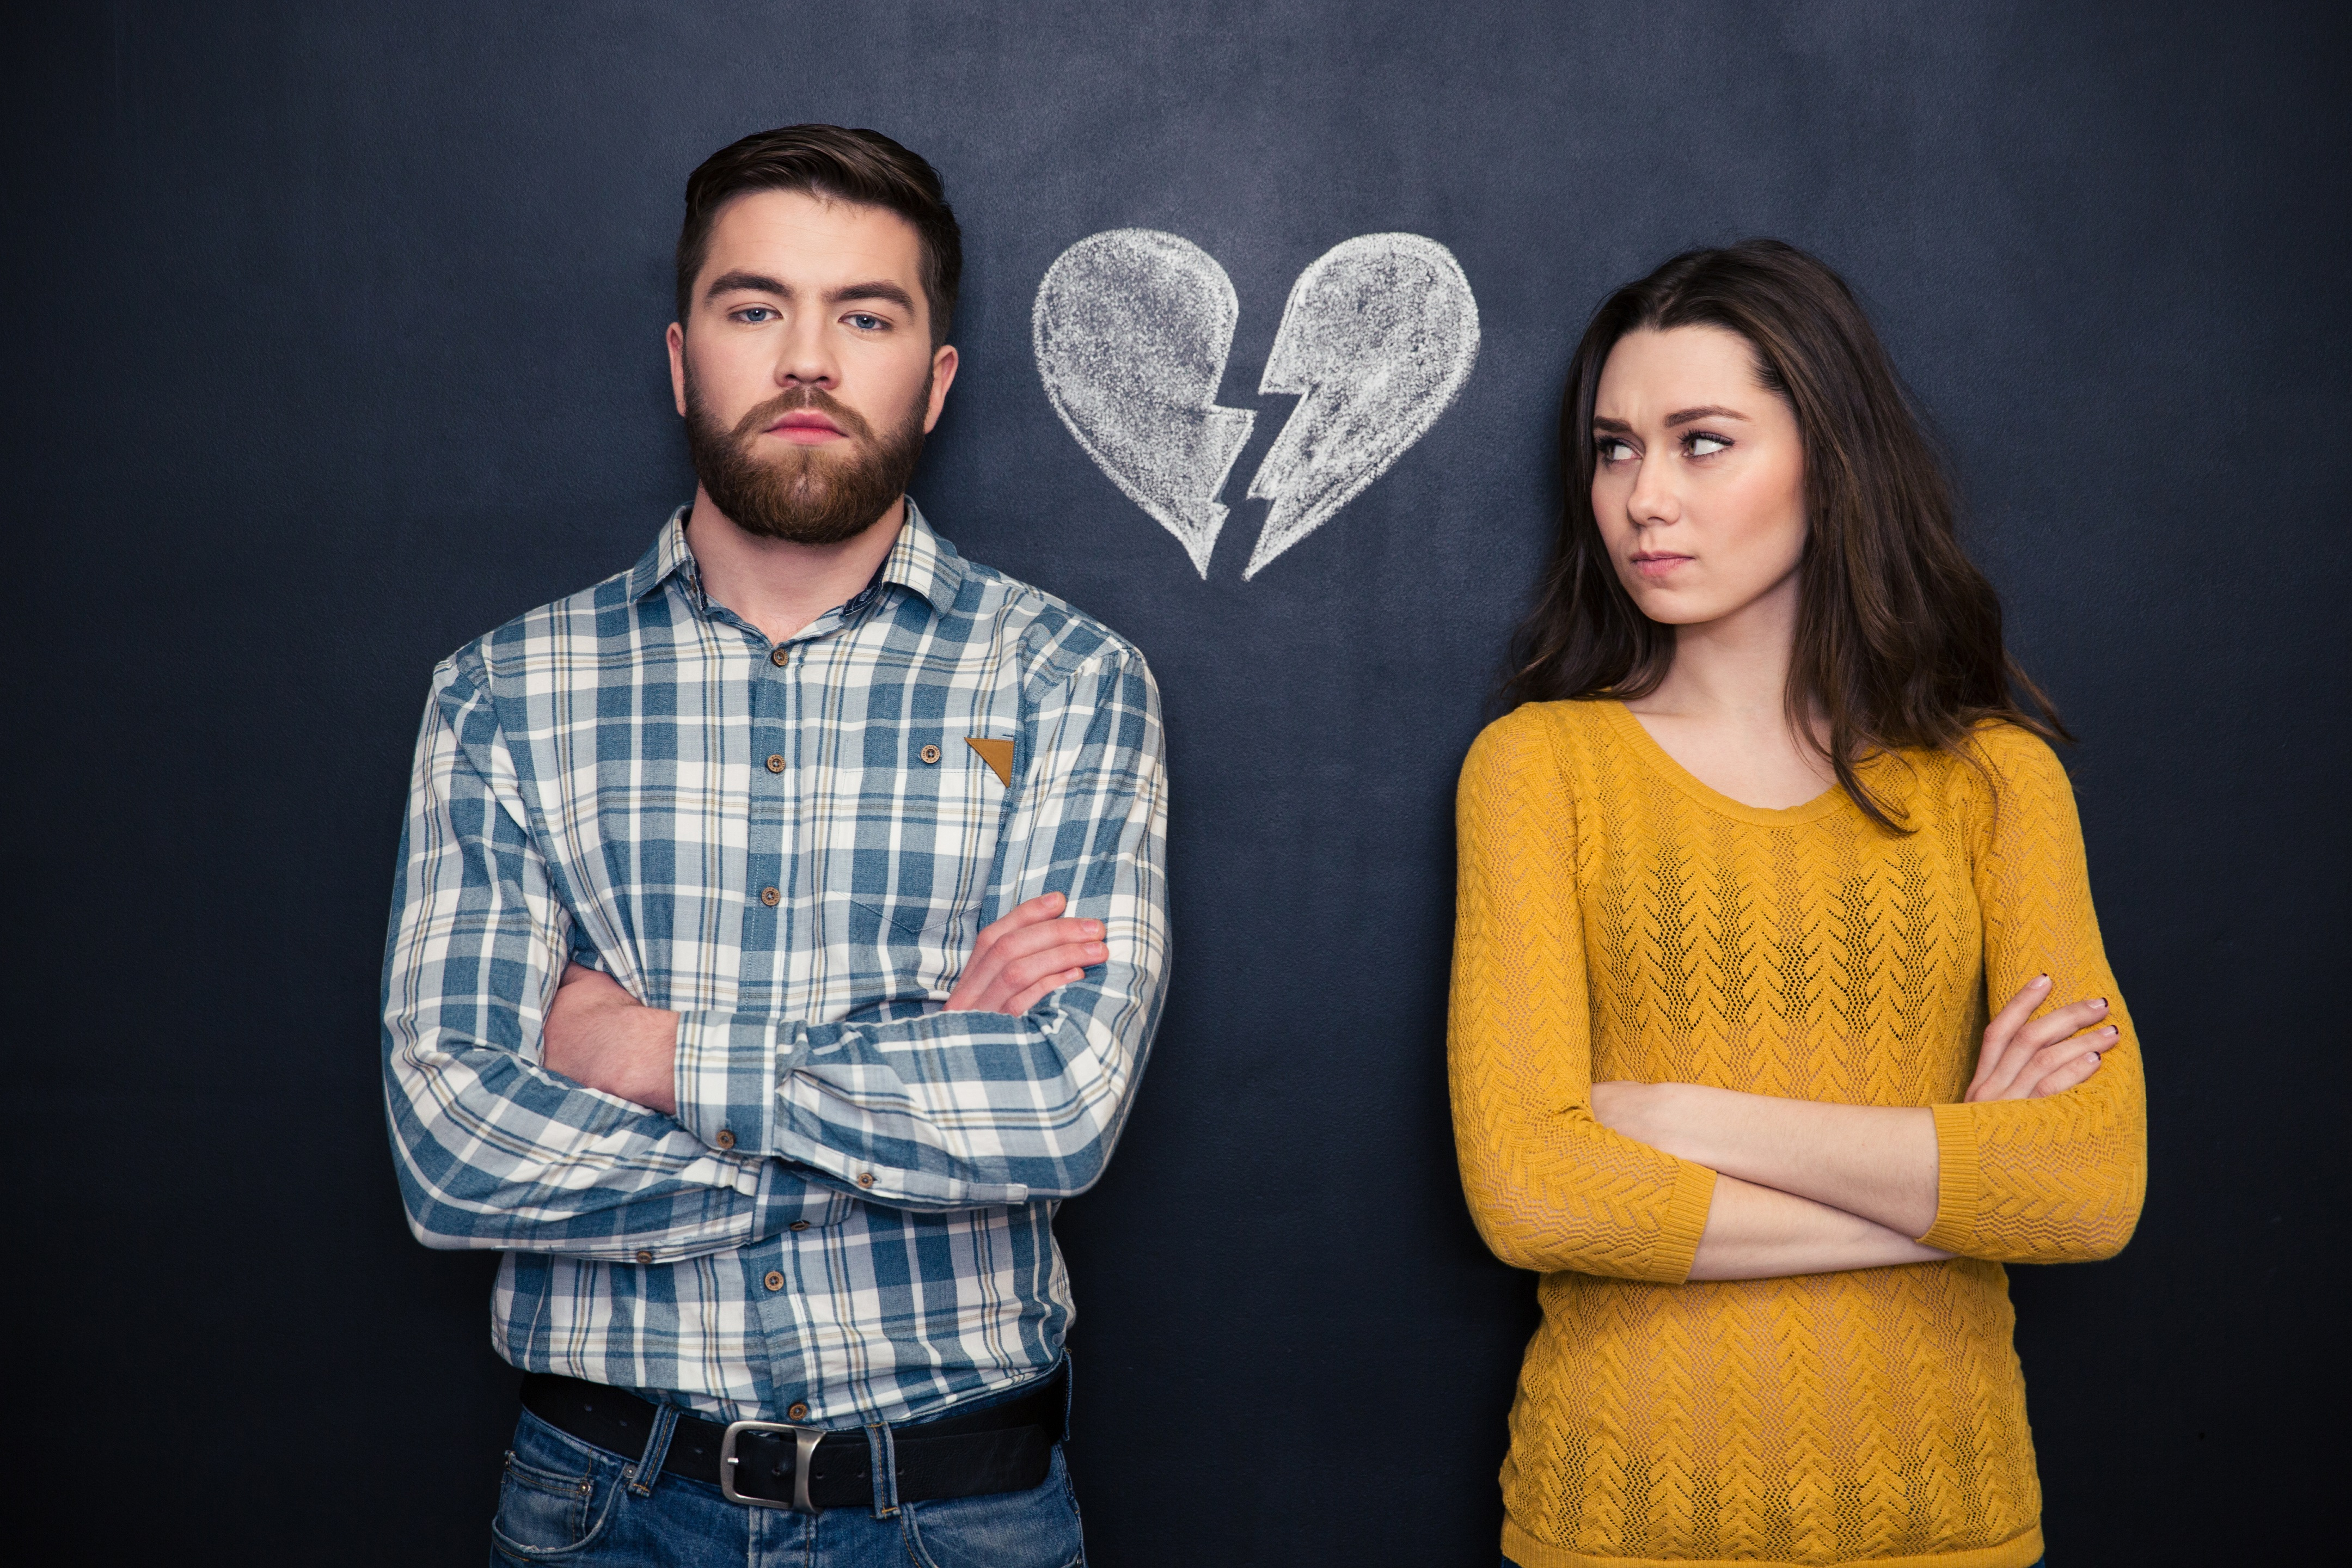 Divorcing a Narcissist | Psychology Today